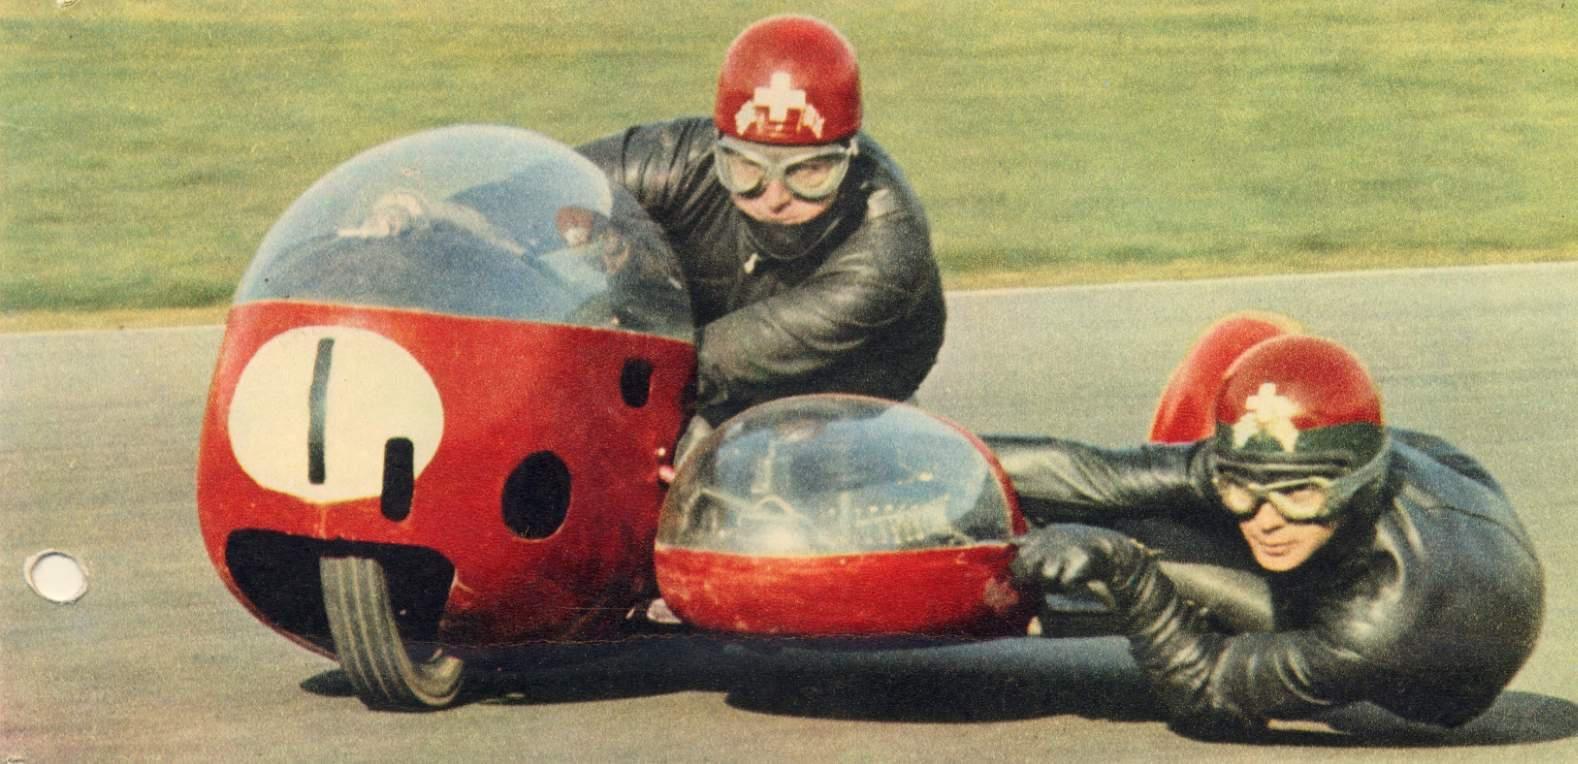 Sidecar back in '67